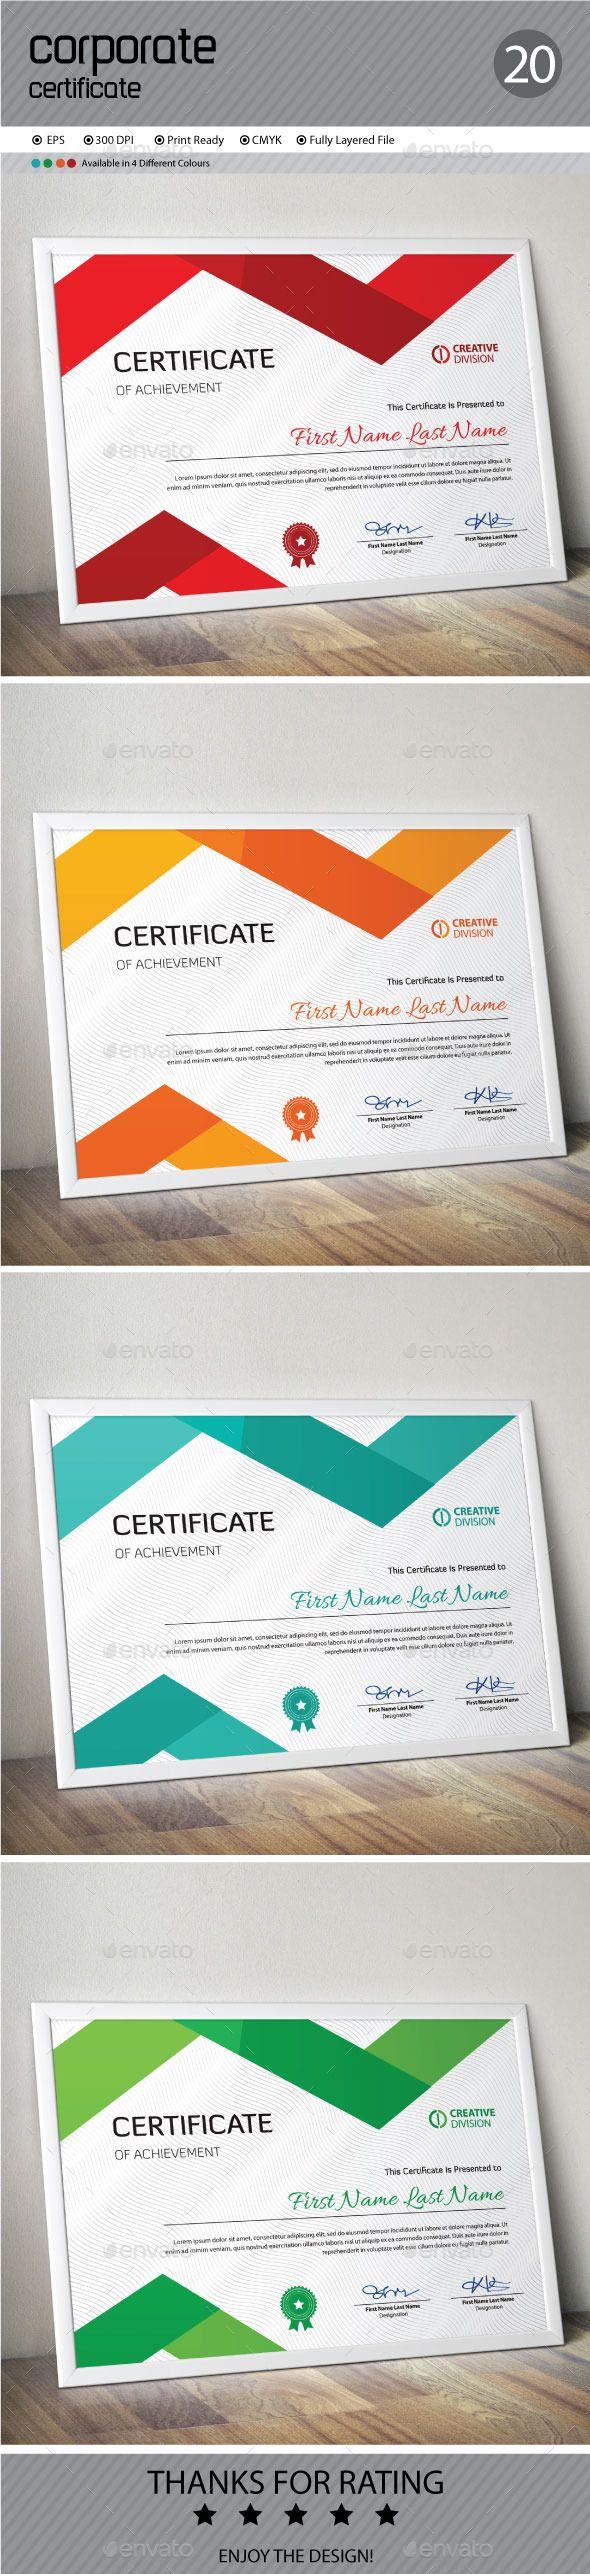 Certificate Template Vector EPS. Download here: http://graphicriver.net/item/certificate/12709584?ref=ksioks